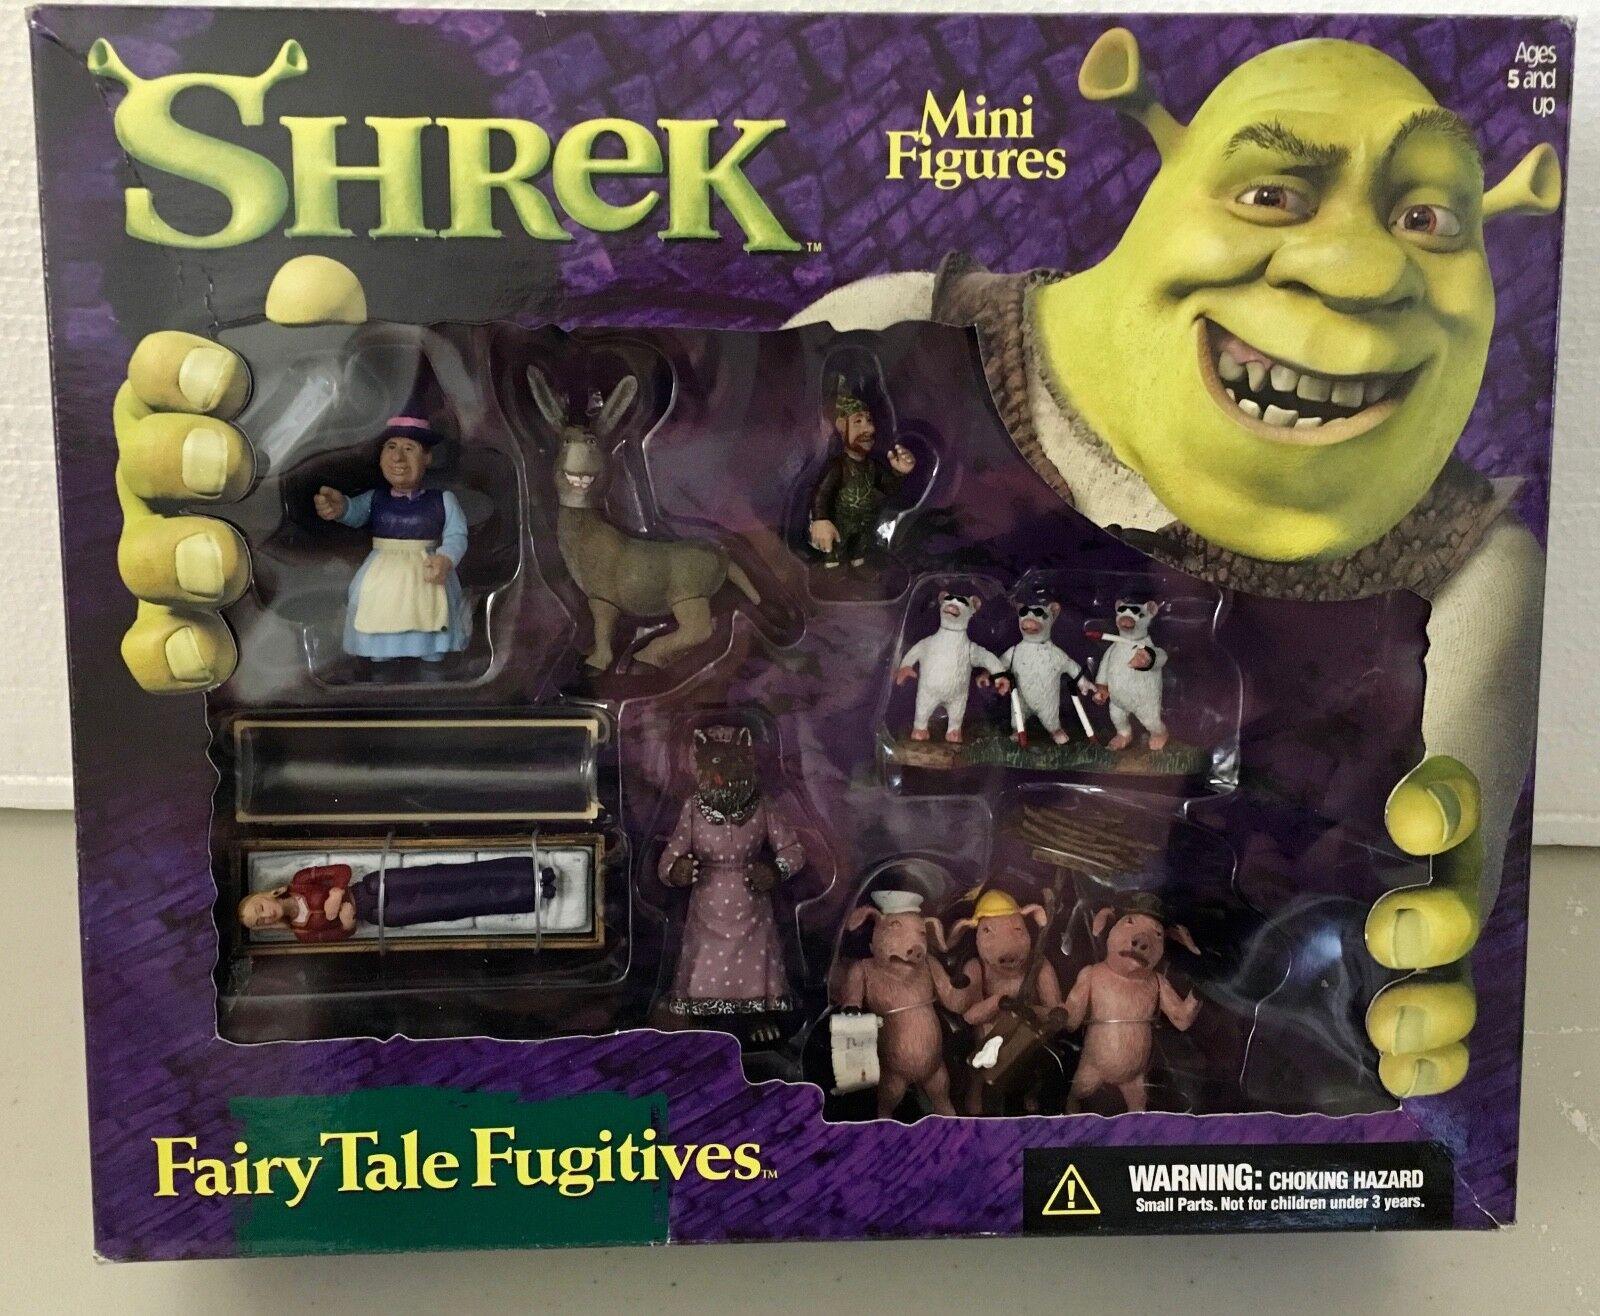 Shrek Mini Figures - Fairy Tale Fugitives - New